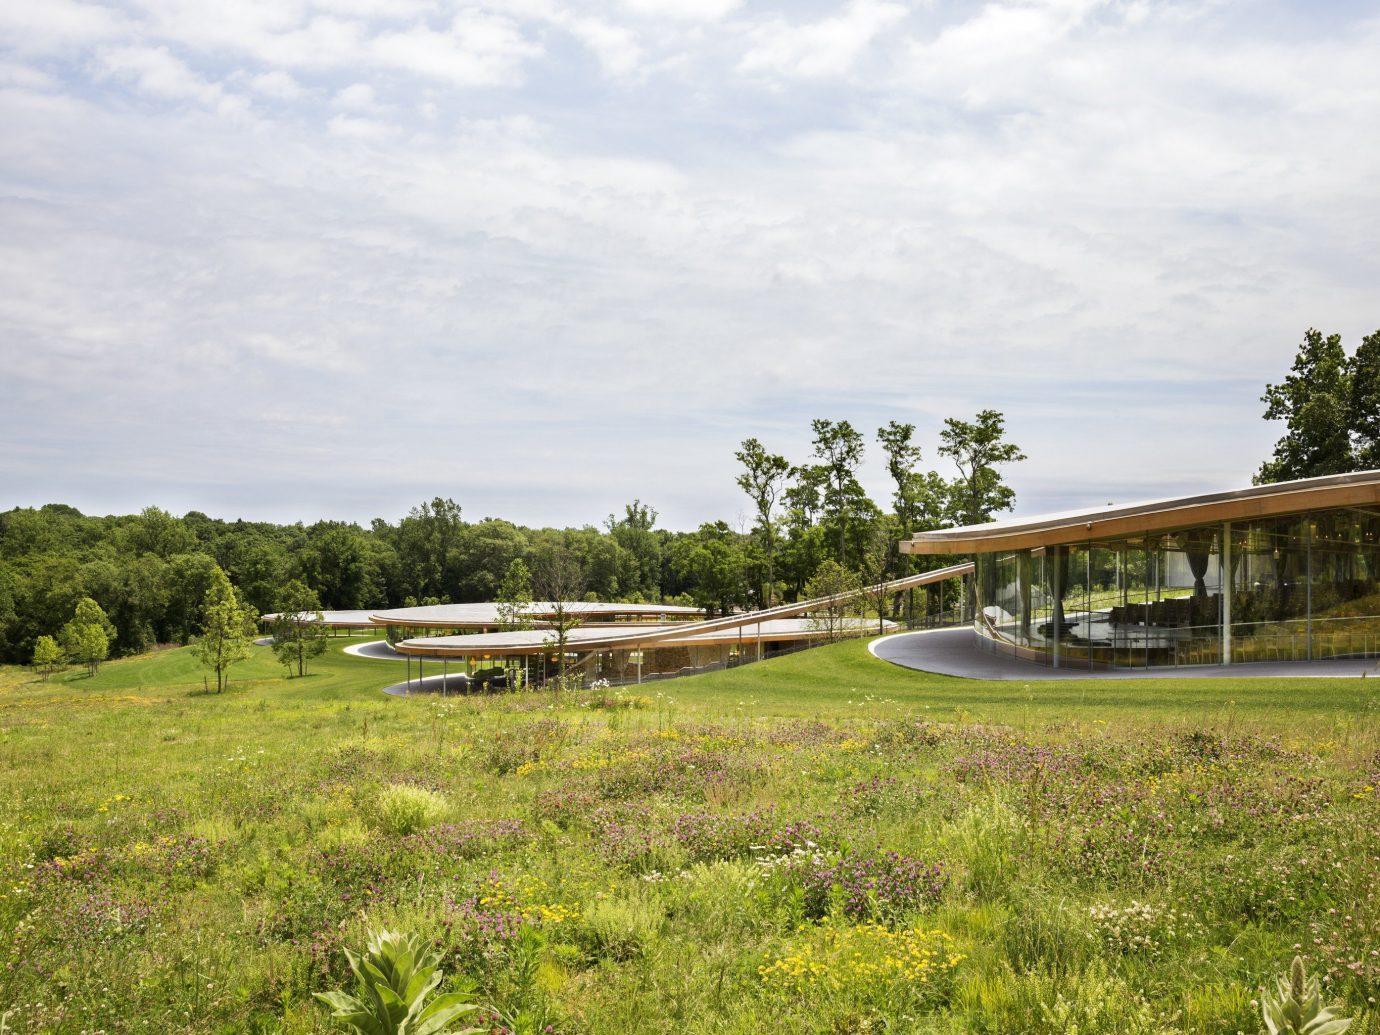 Hotels Trip Ideas grass outdoor sky tree field grassy rural area estate landscape green lush day